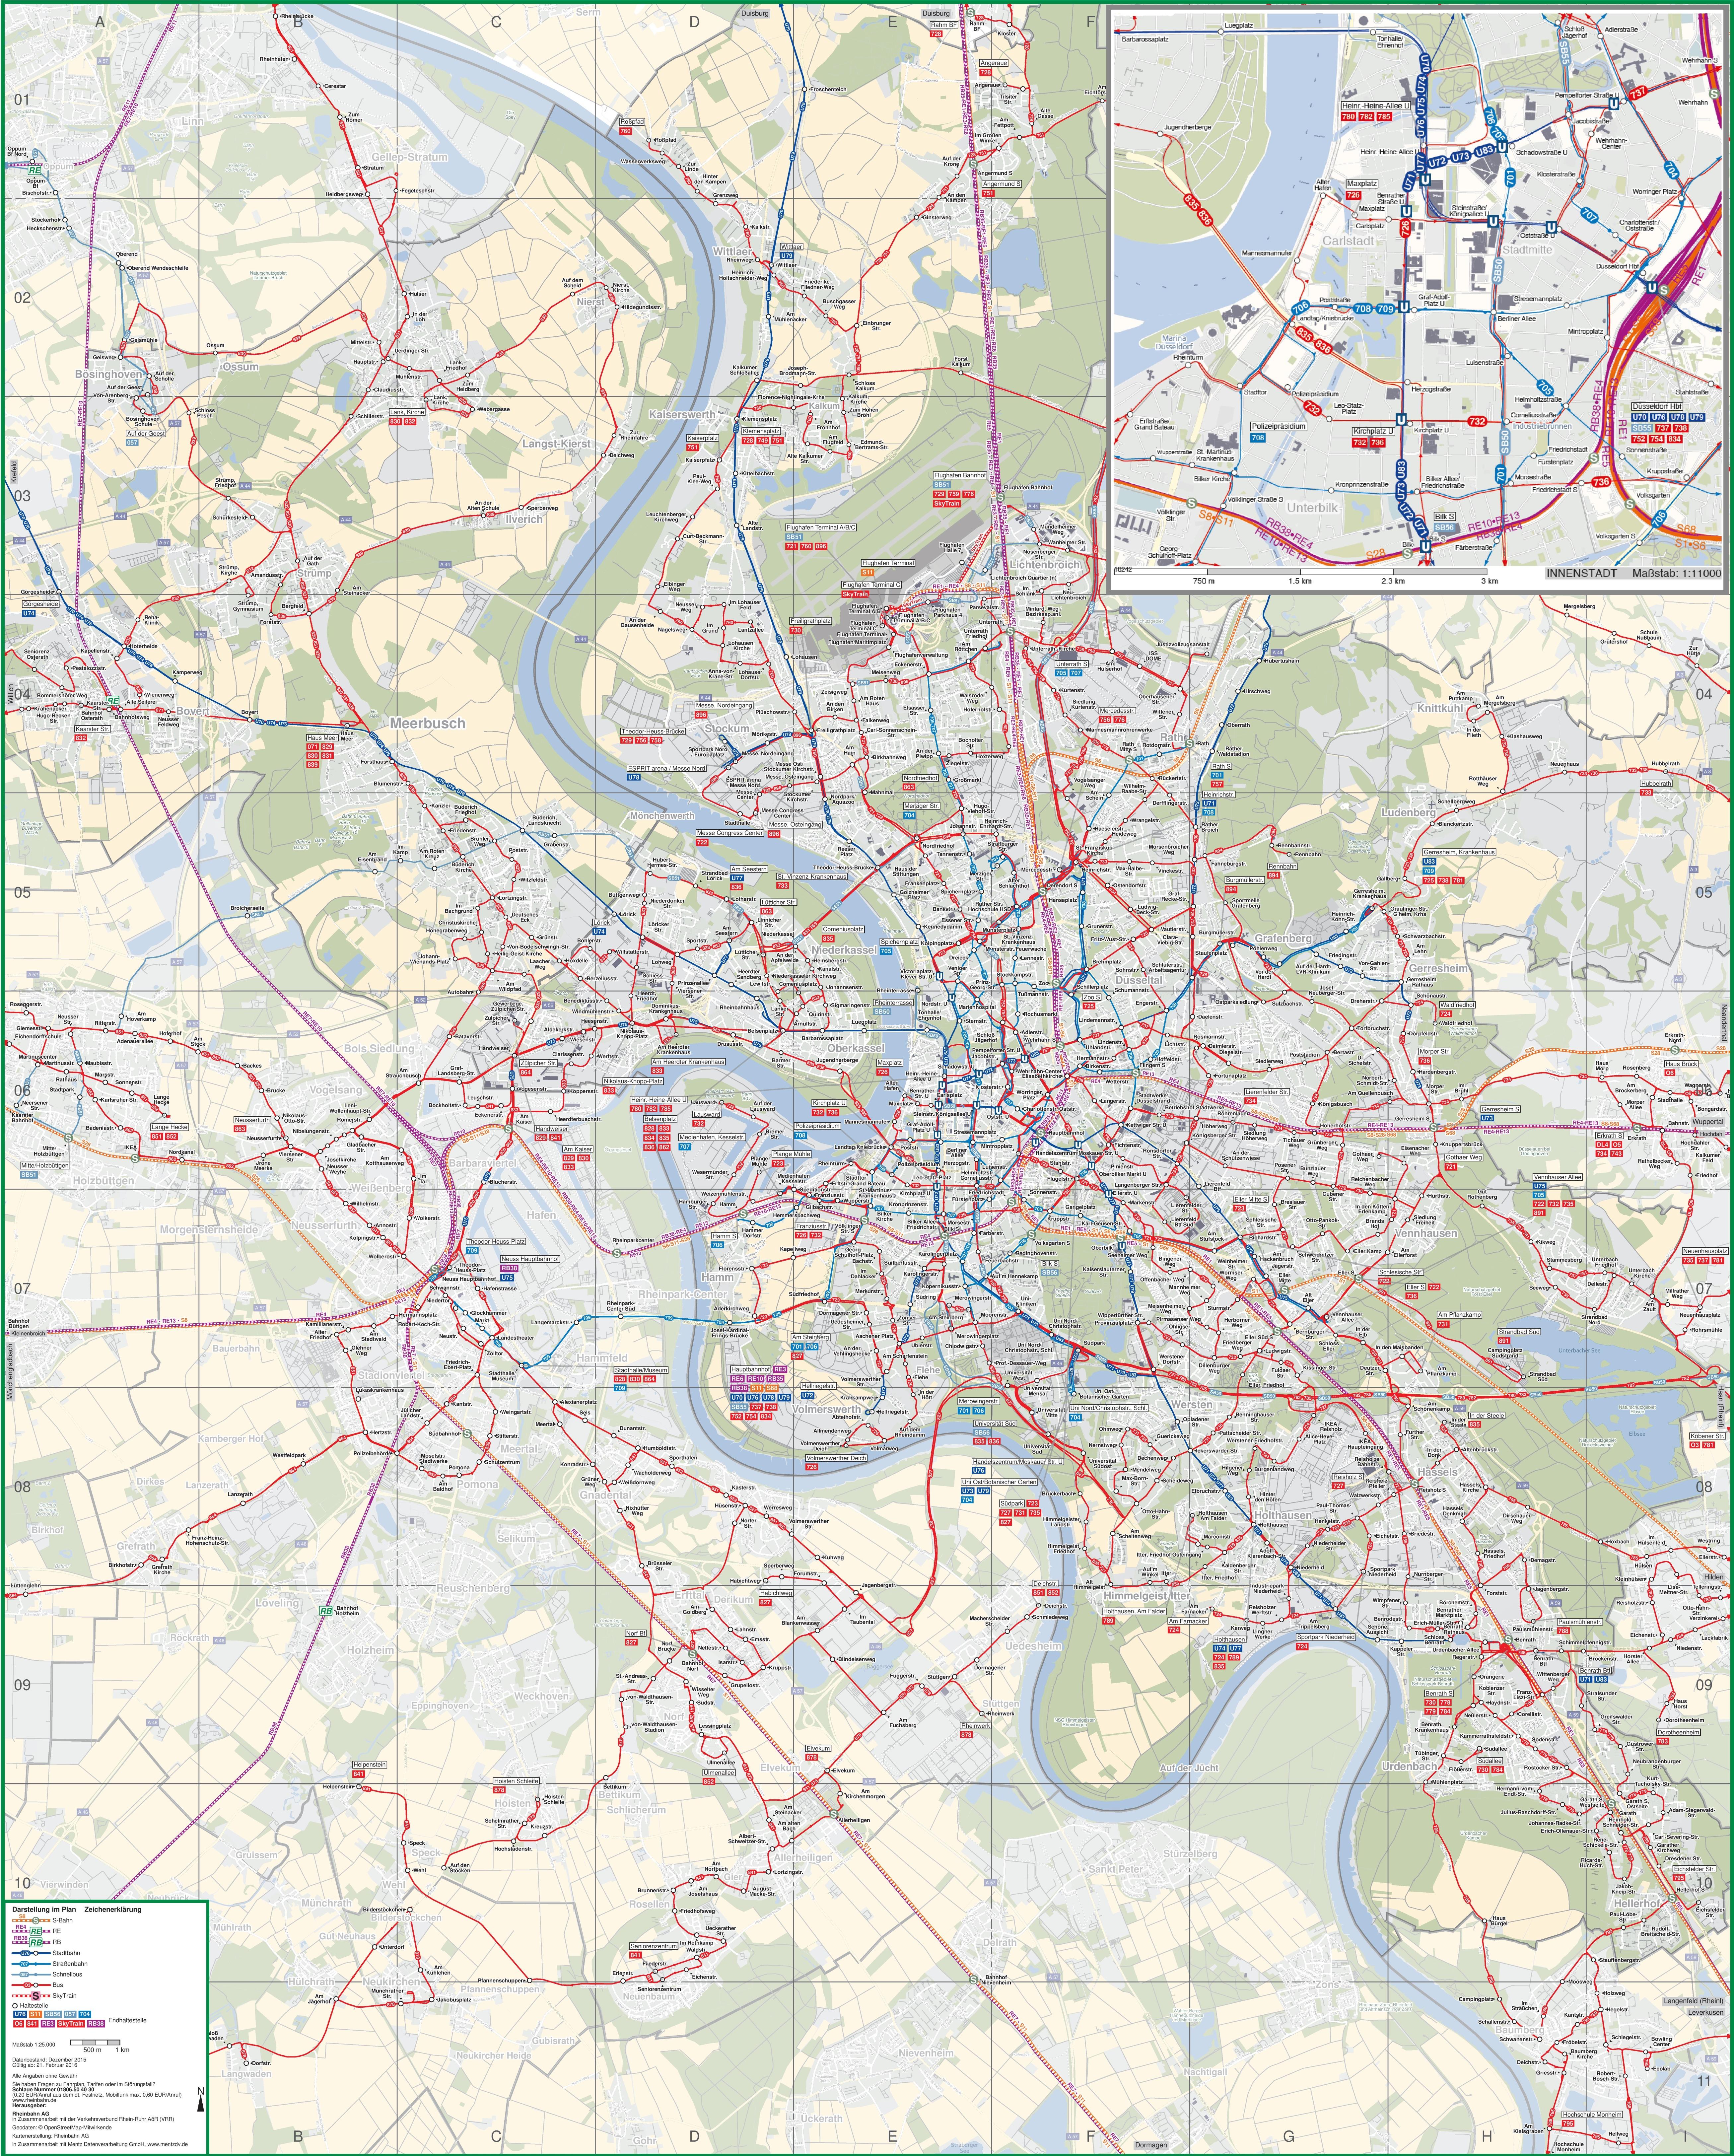 Düsseldorf Area Transport Map - Dusseldorf metro map